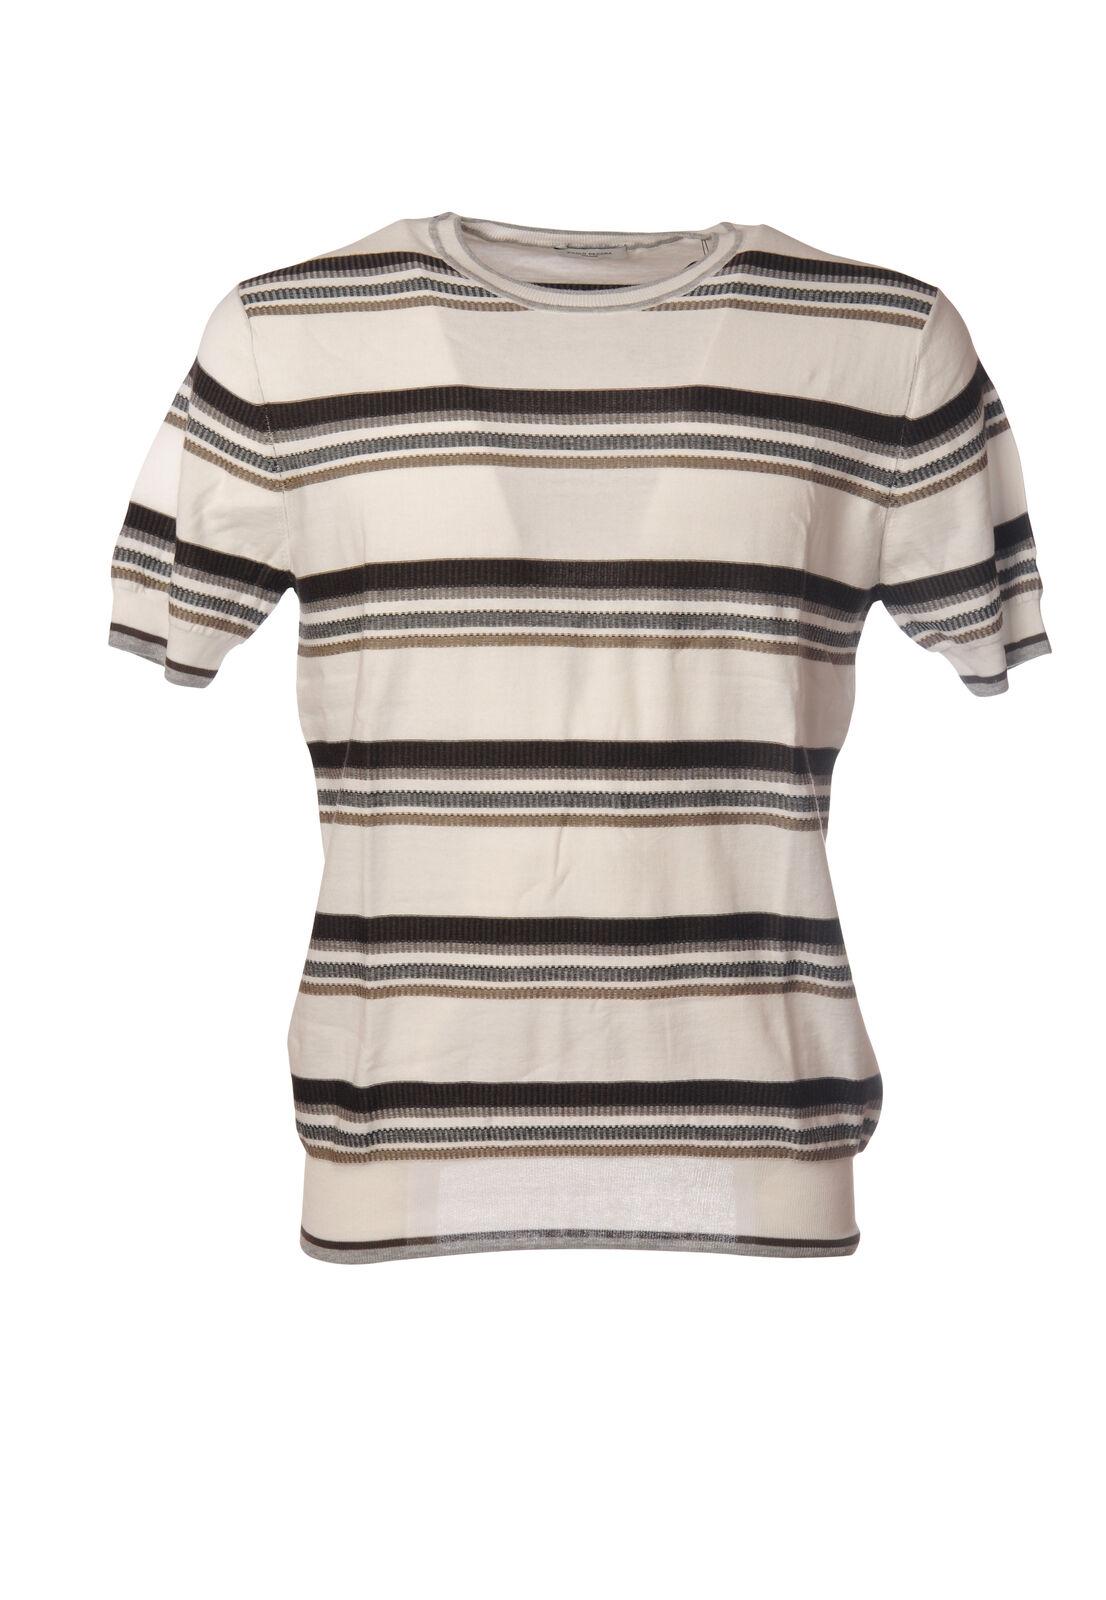 Paolo Pecora - Knitwear-Sweaters - Man - Fantasy - 5304929E184004